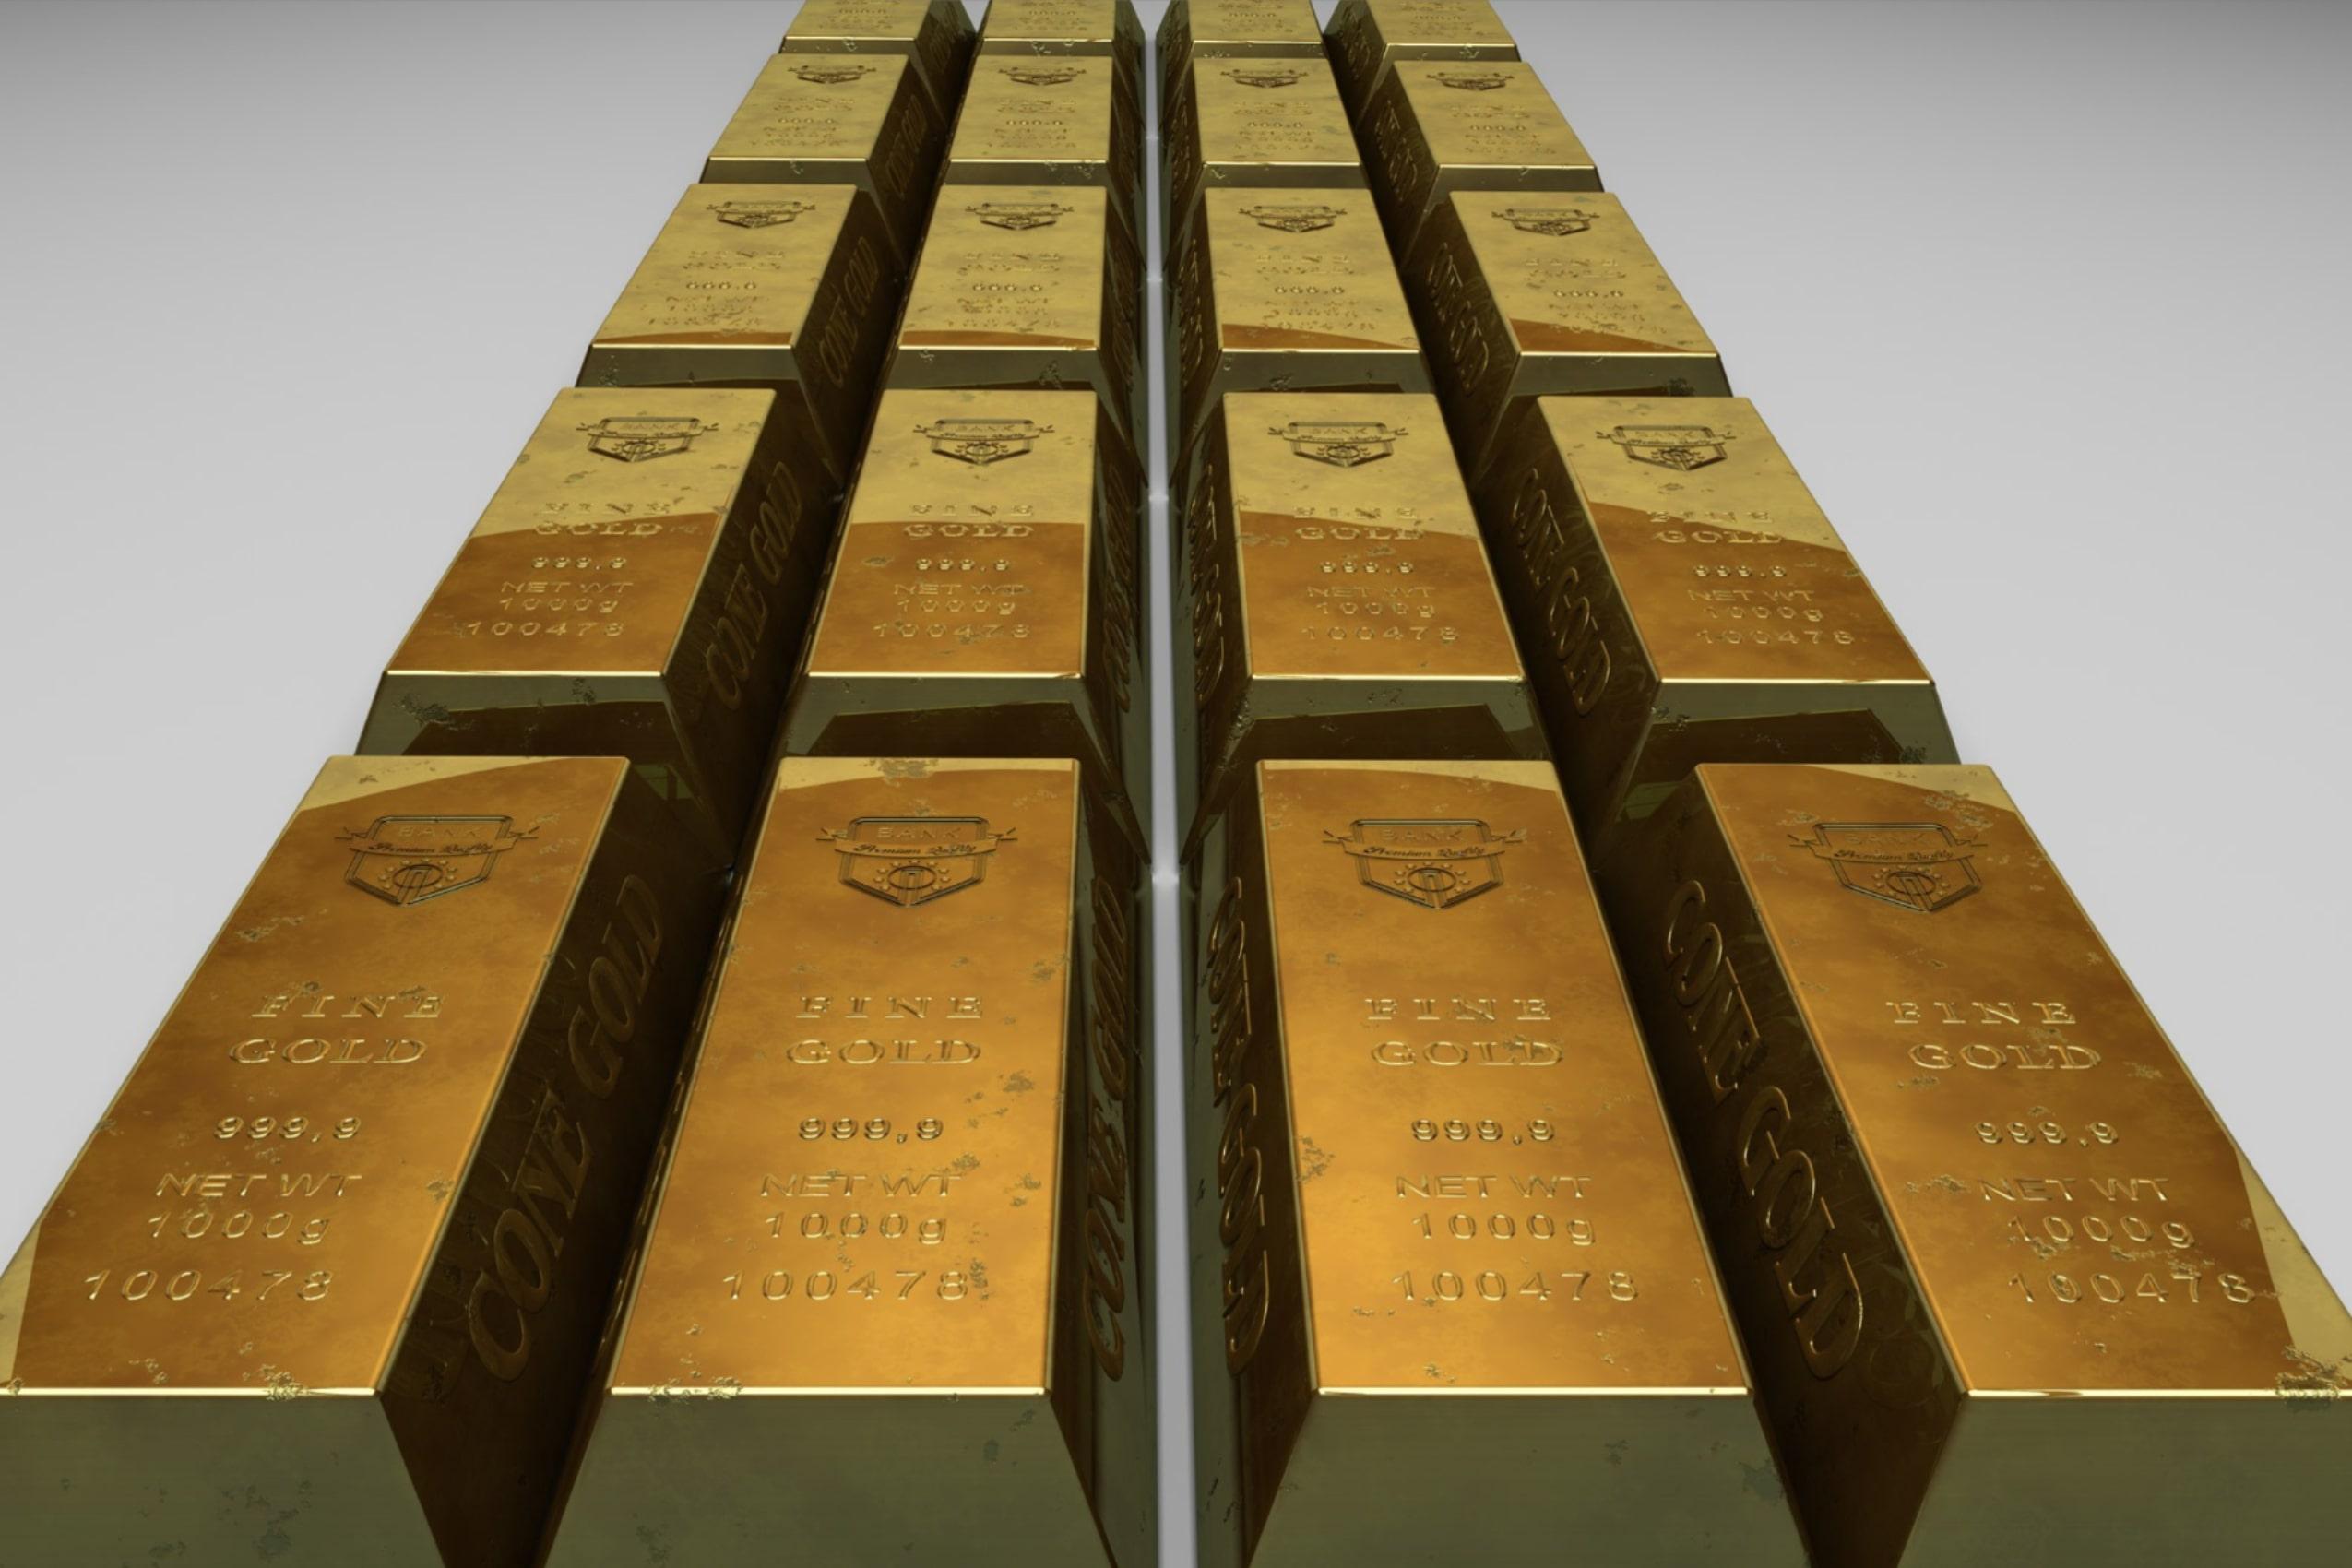 Investasi Saham Antam atau Emas Antam, Mana Lebih Untung?